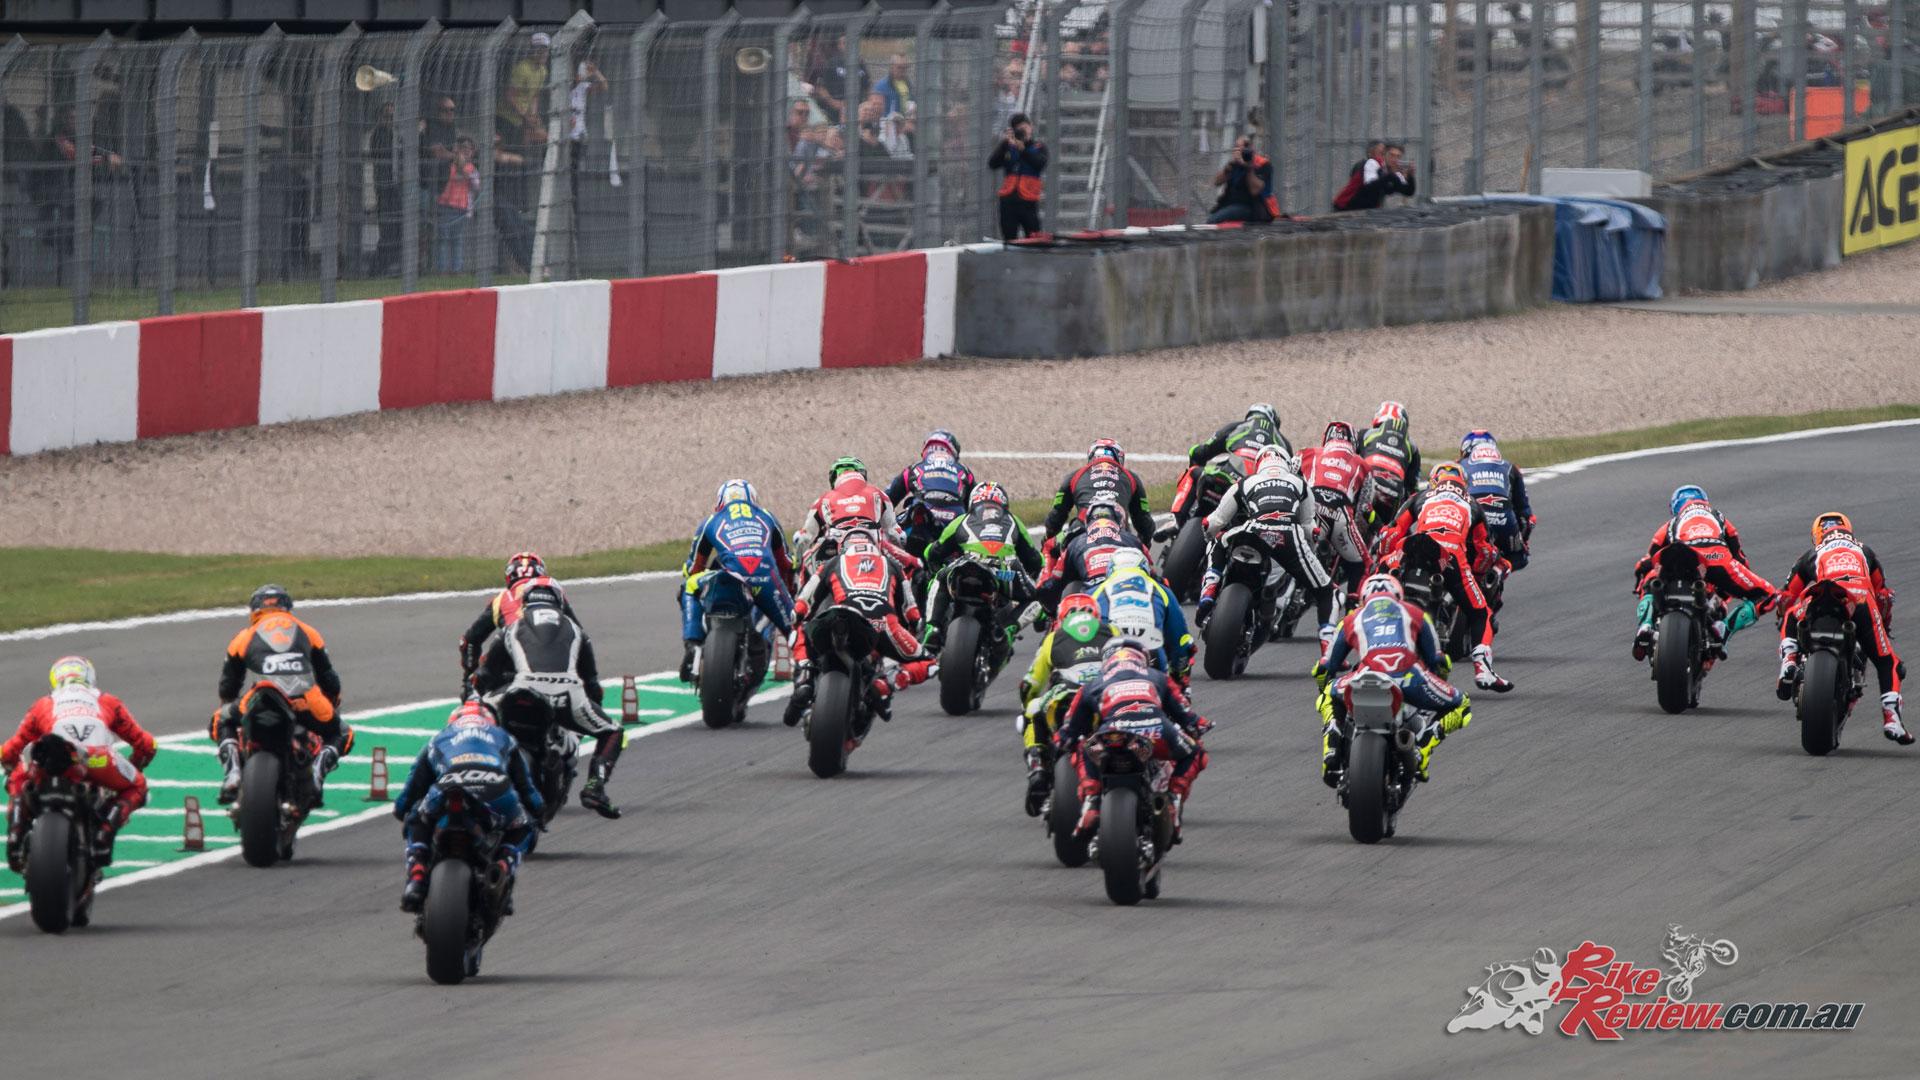 World Superbikes at Donington